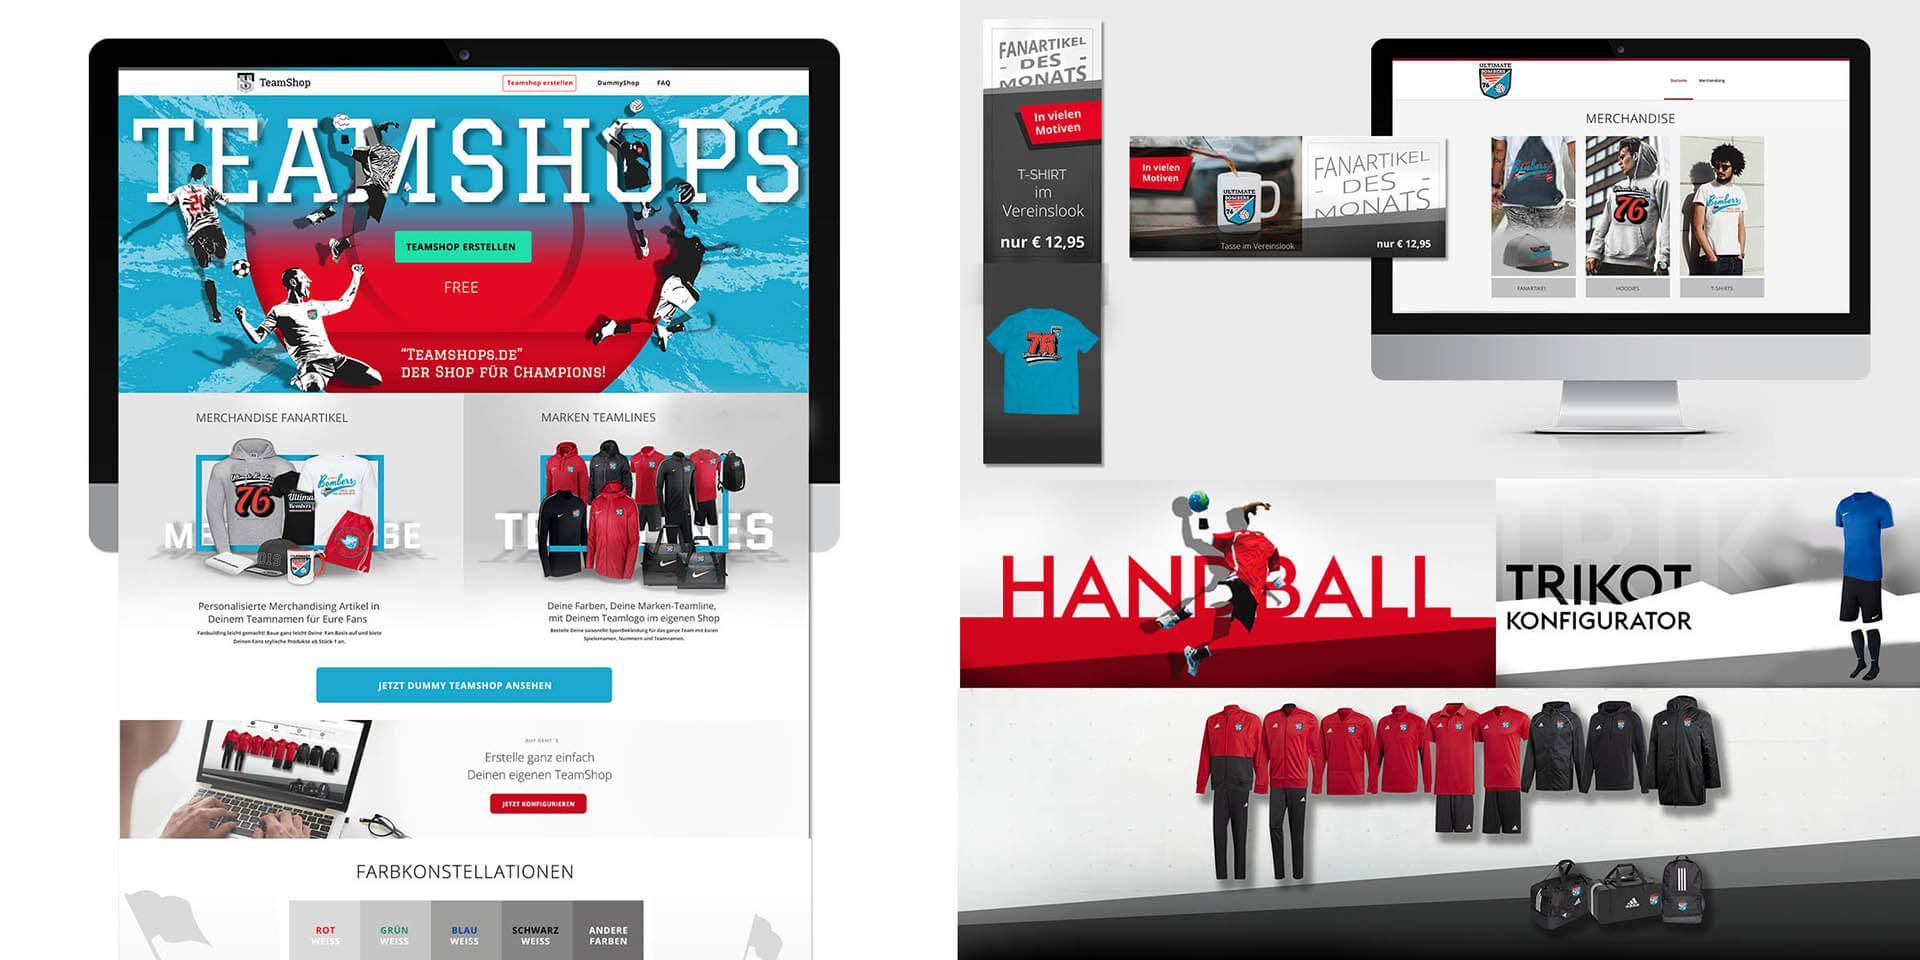 18 gfd gregor fenger designworks for fa sports branding corporate design smm sma social media marketing online